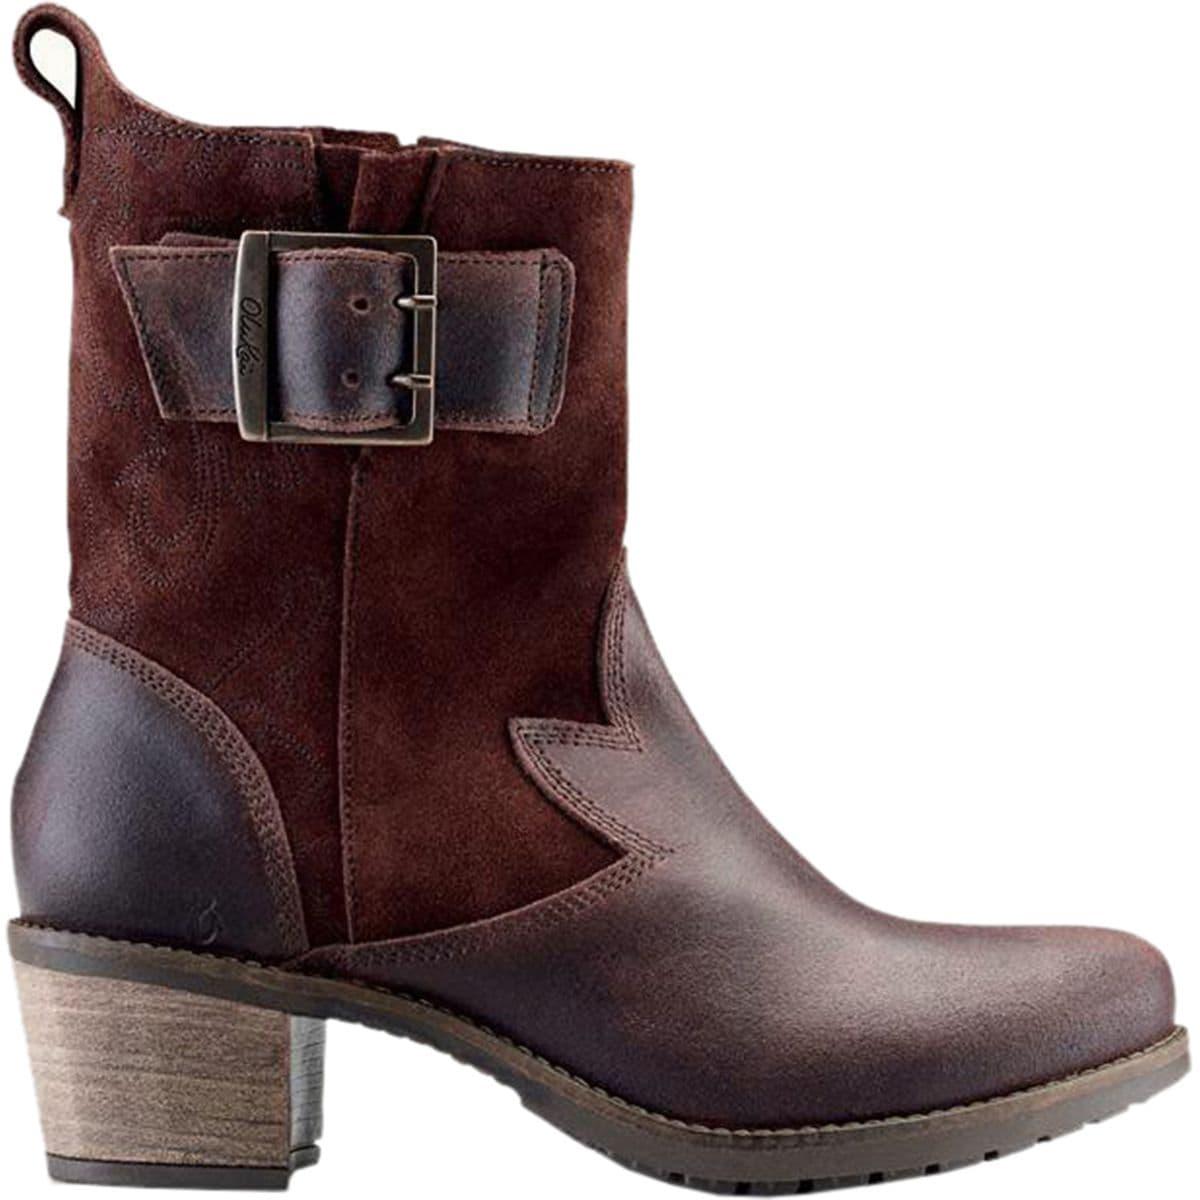 Olukai Ka'iulani Boot - Women's